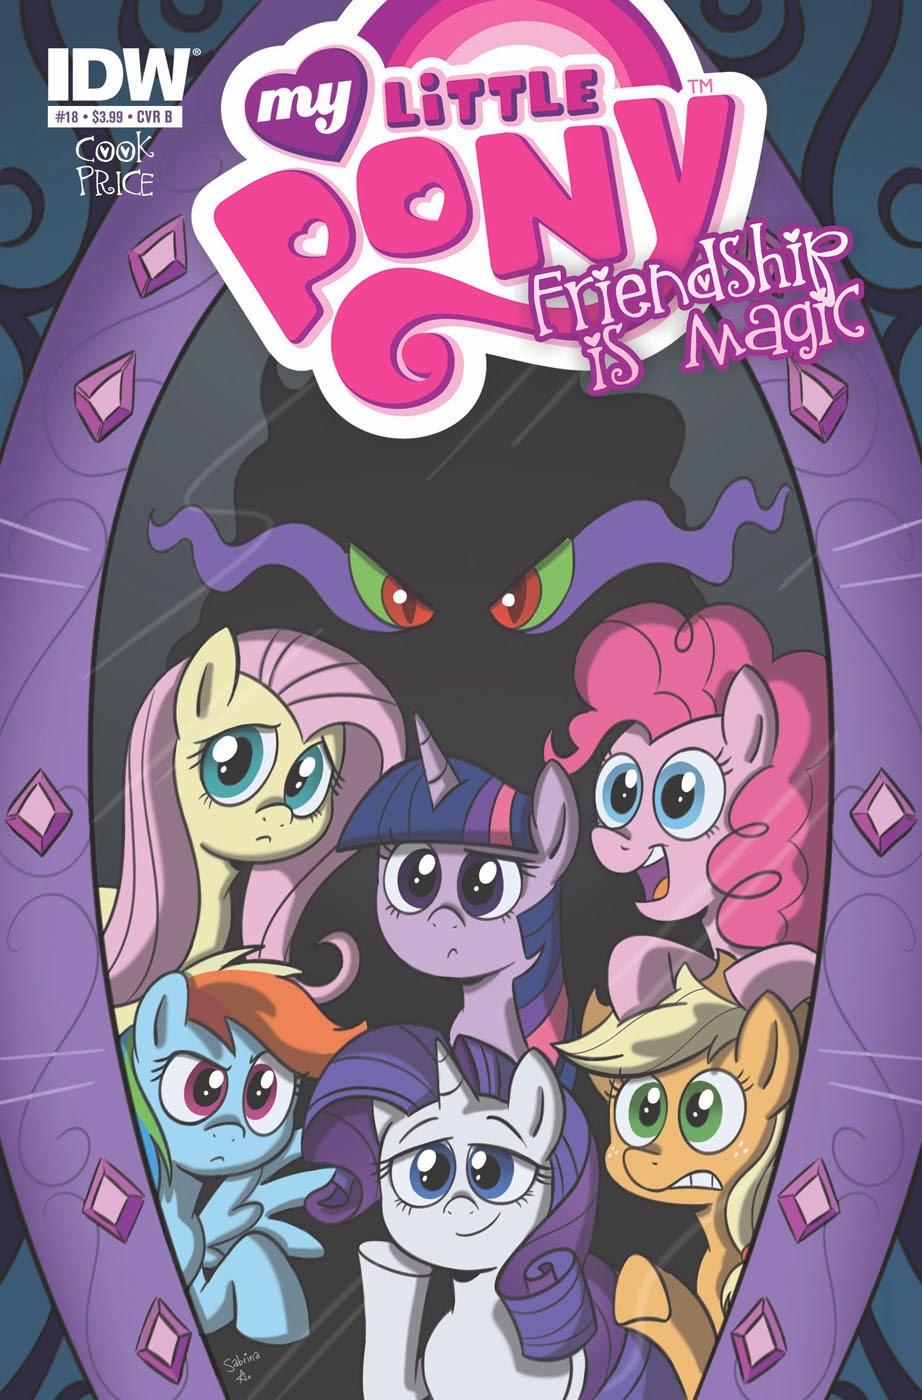 My Little Pony: Friendship is Magic, Vol. 2 - IDW Publishing